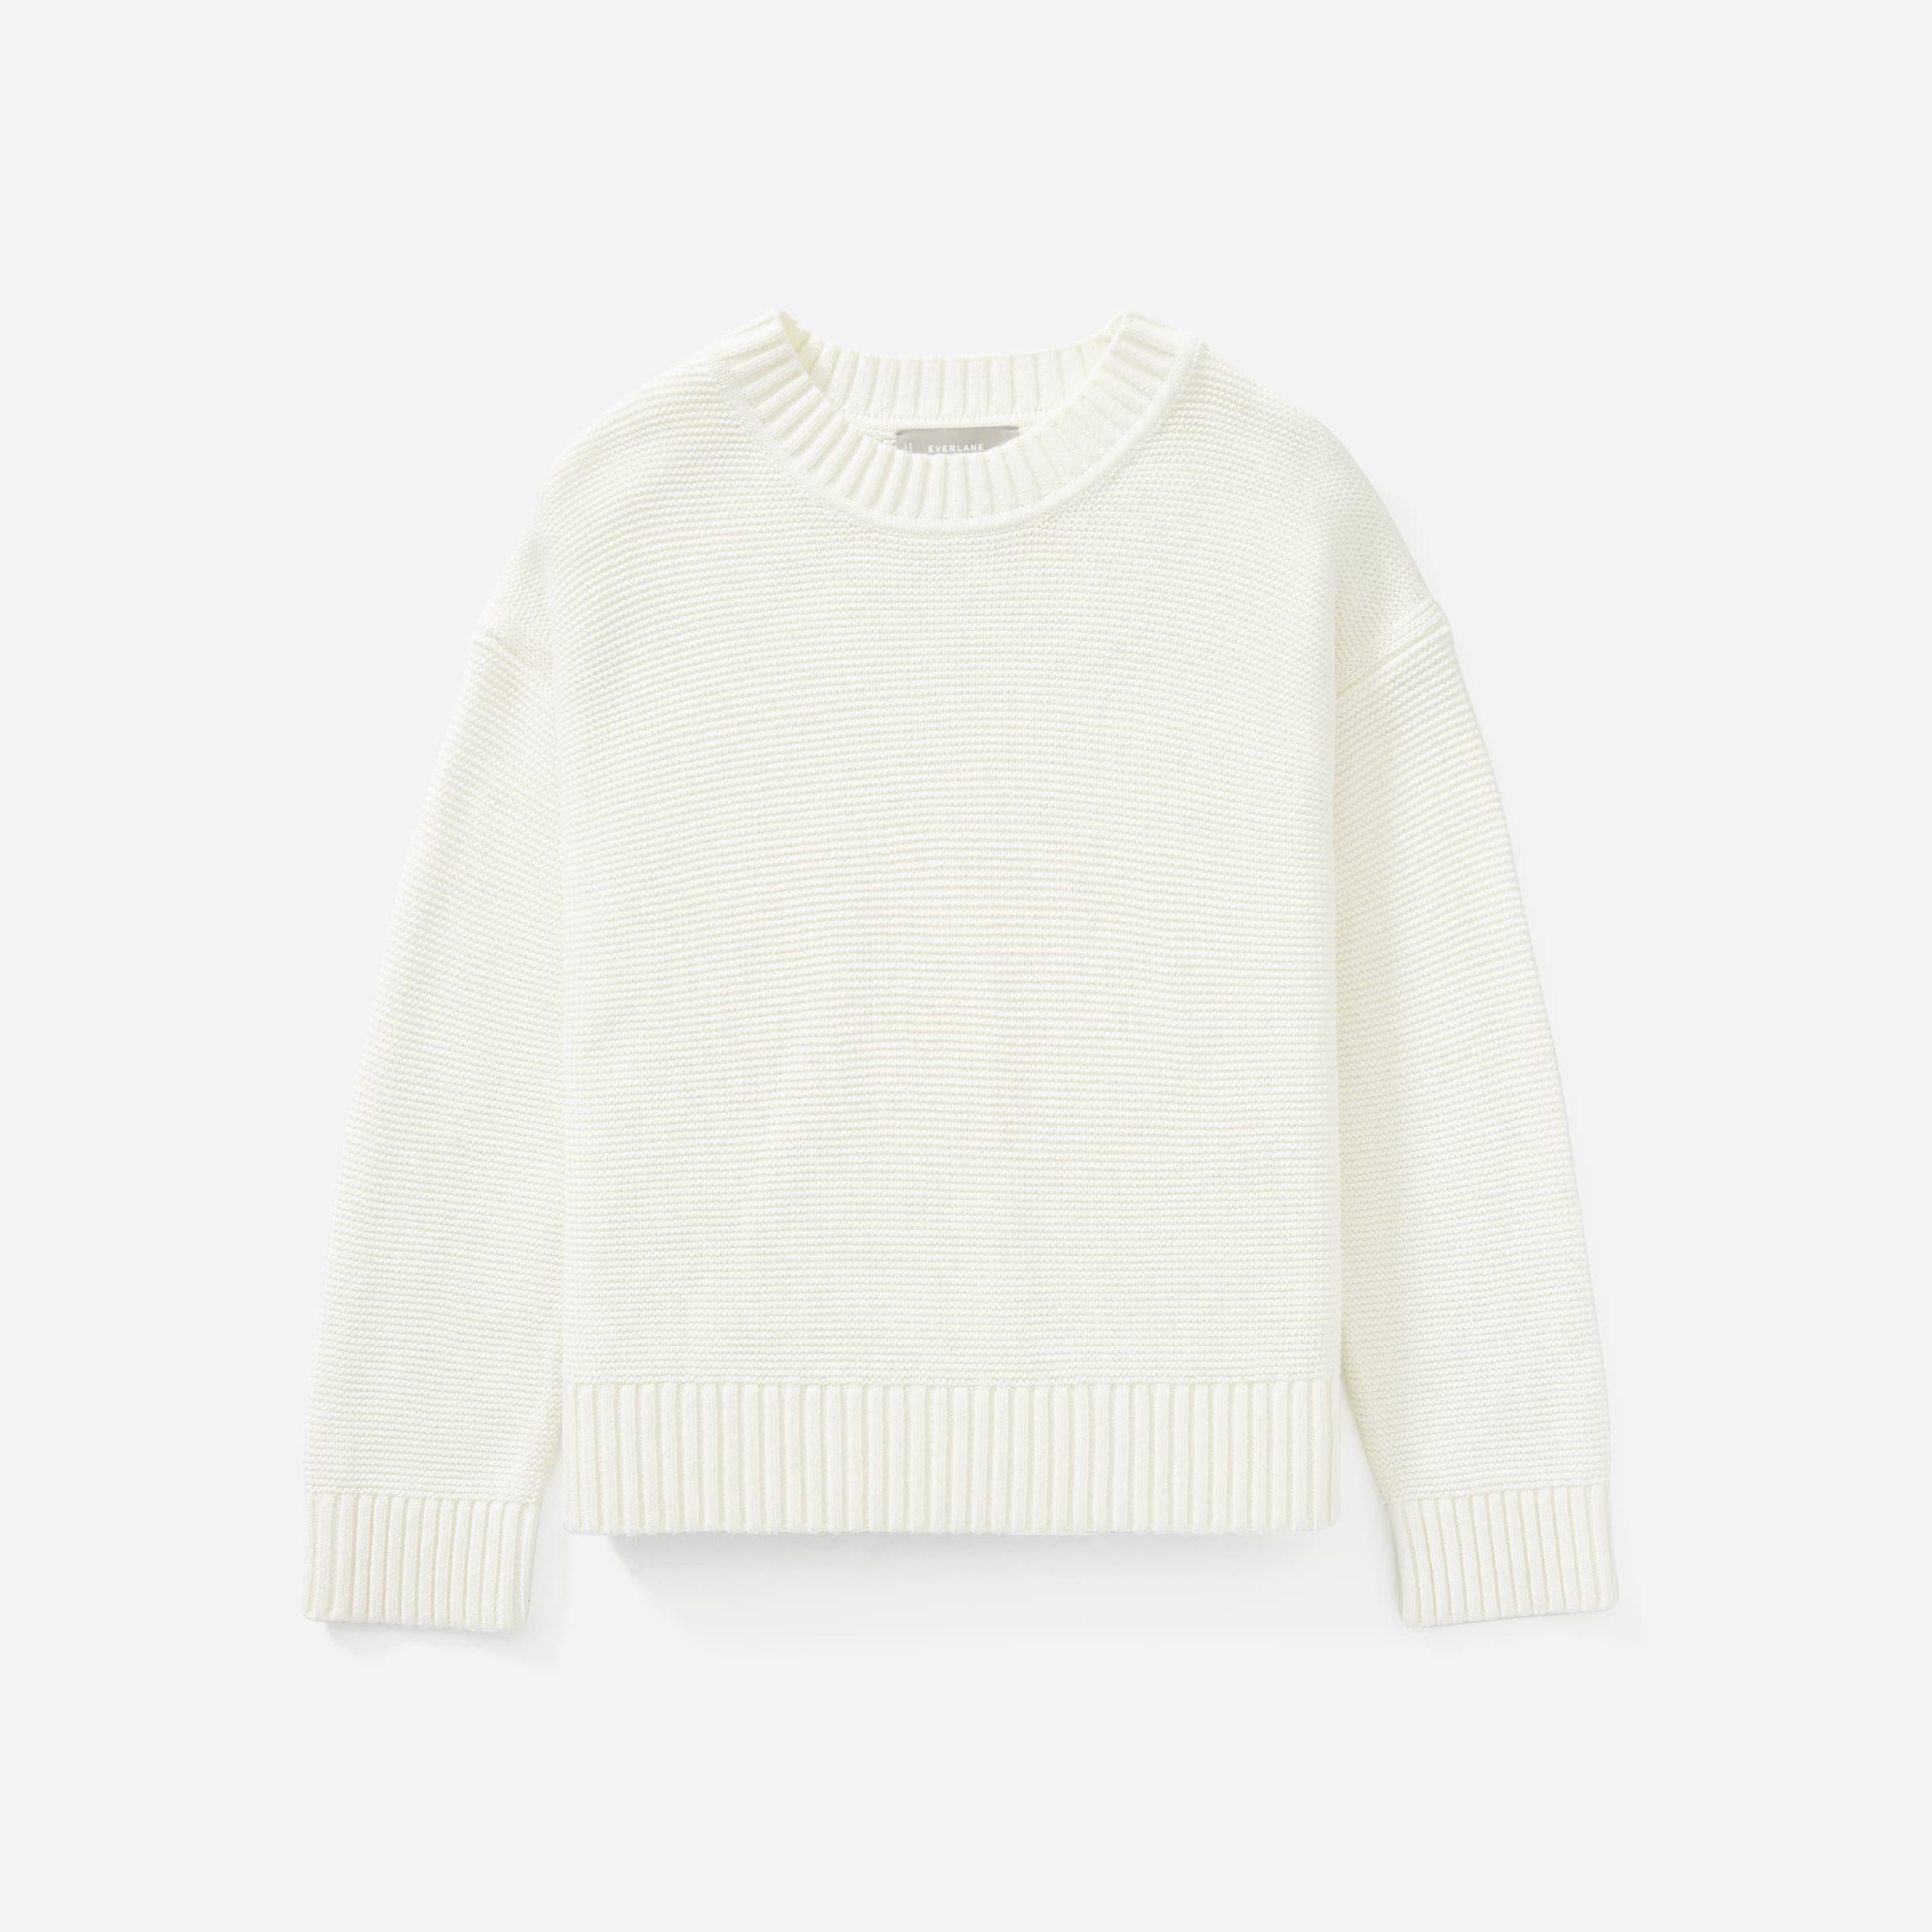 The Link-Stitch Crewneck Sweater | Everlane